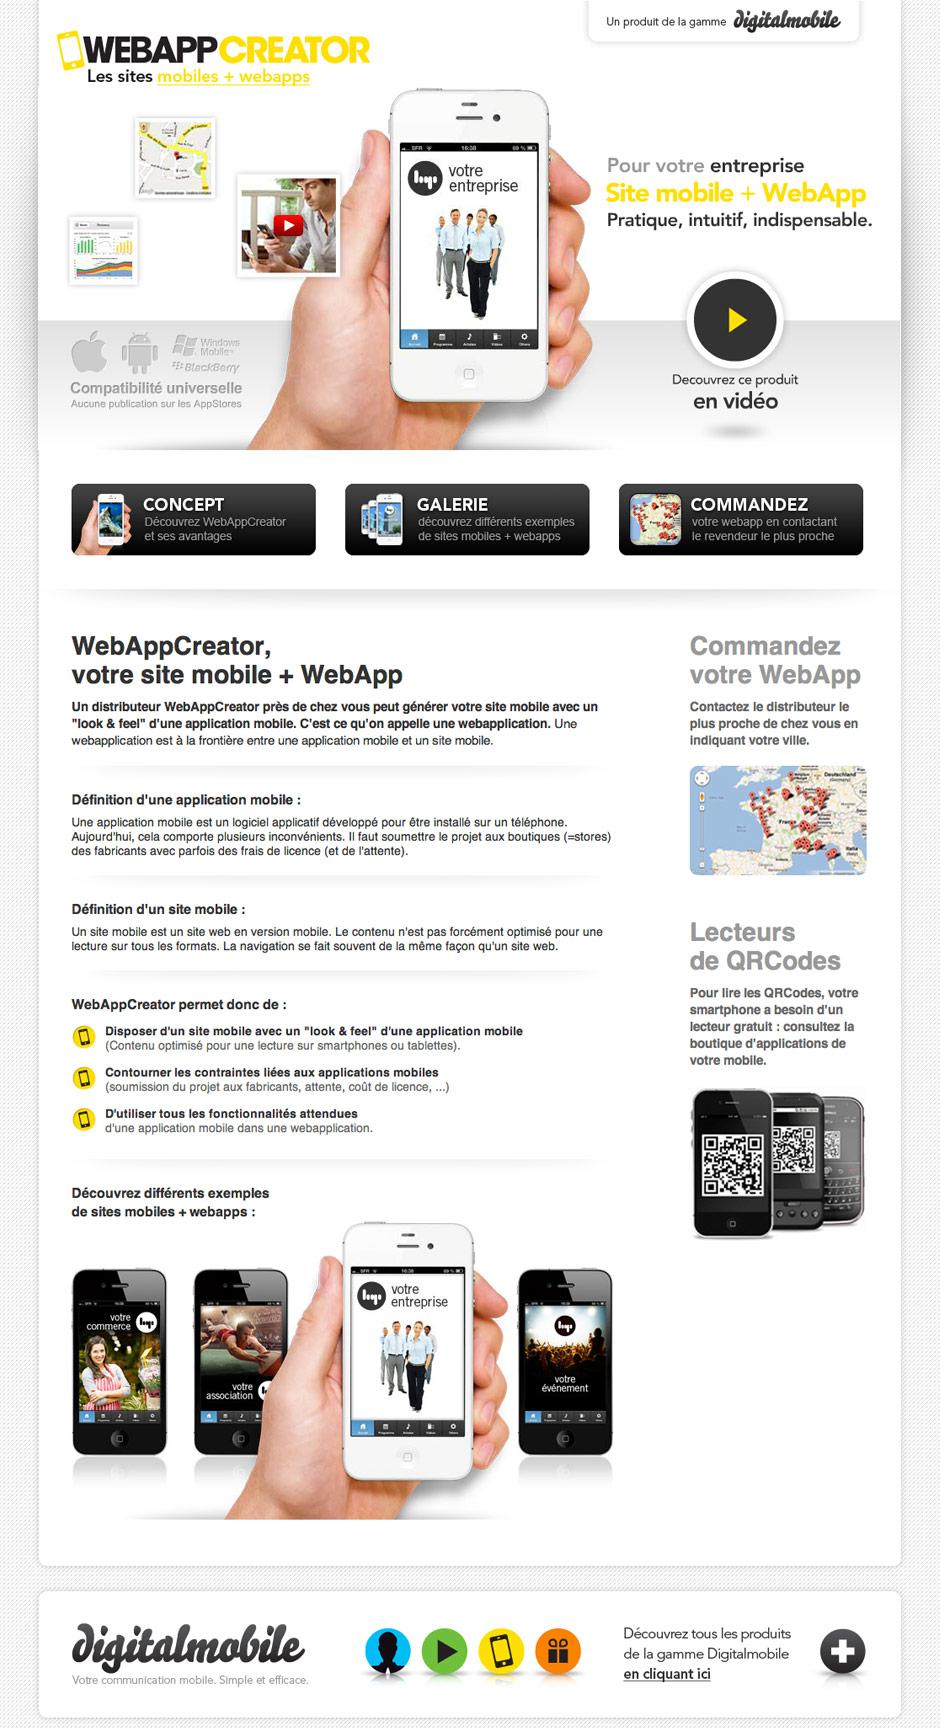 graphiste-montpellier-creation-exaprint-webappcreator-agence-communication-montpellier-caconcept-alexis-cretin-5